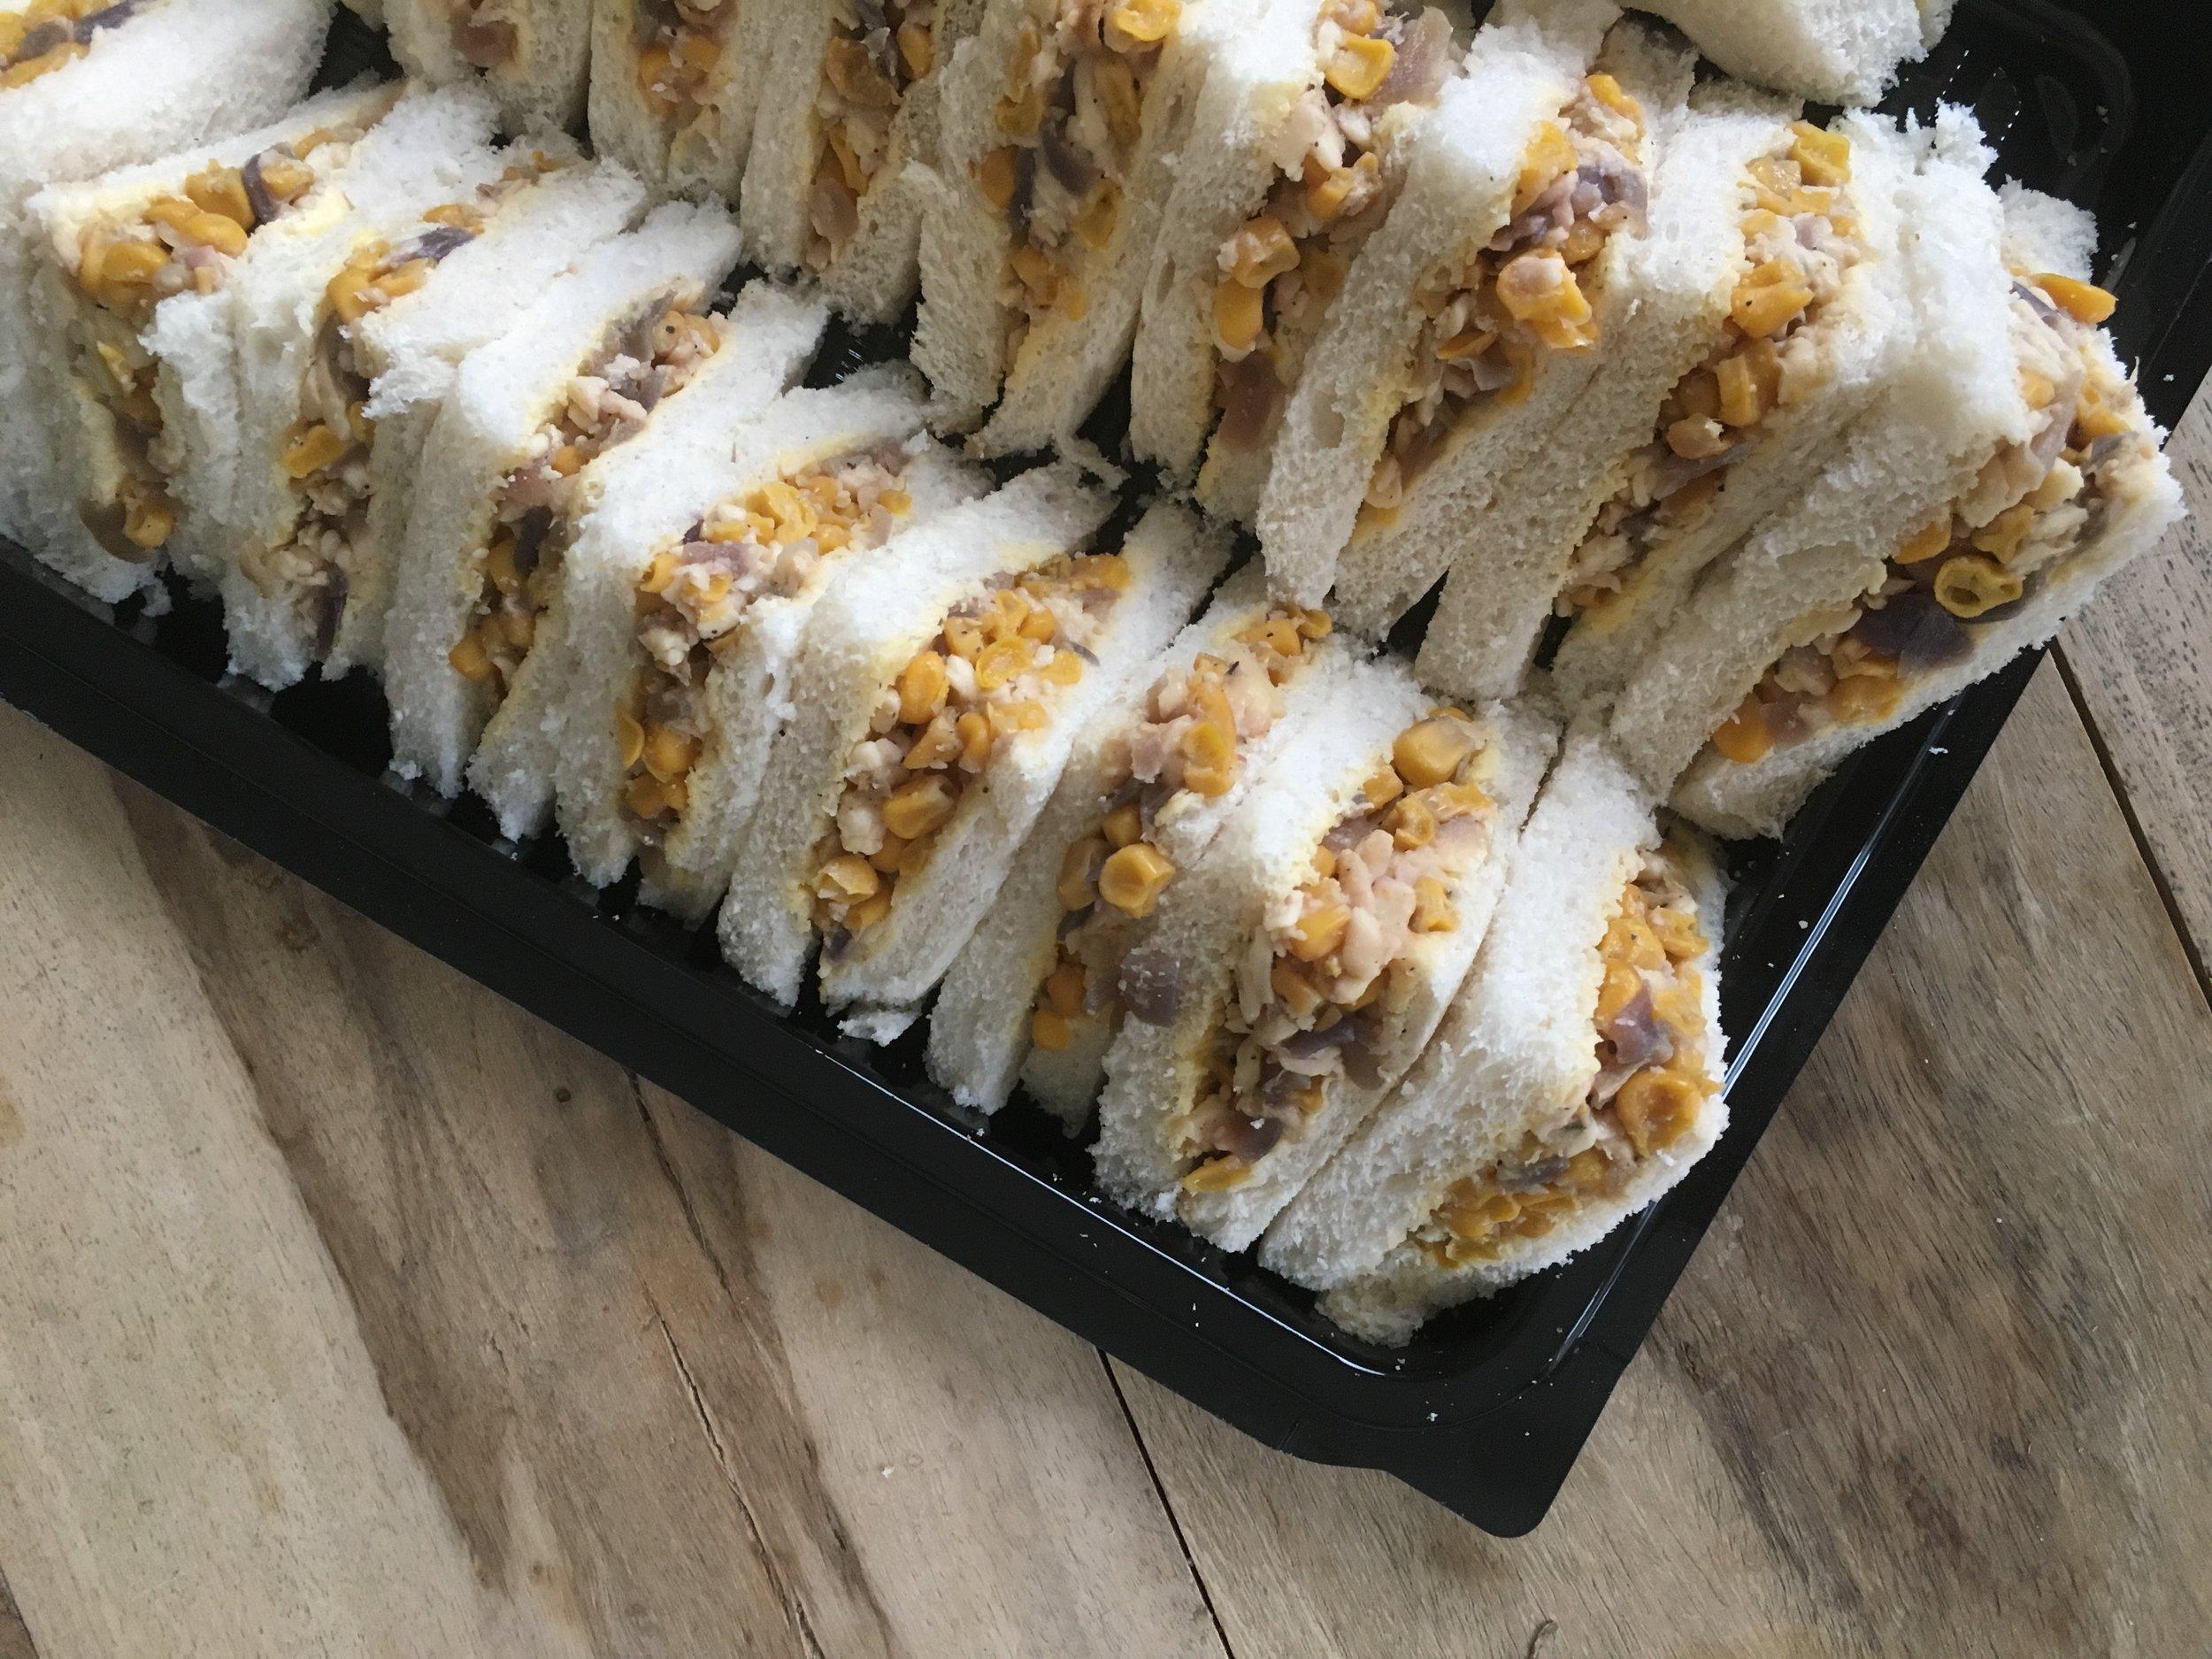 Menu: sandwiches